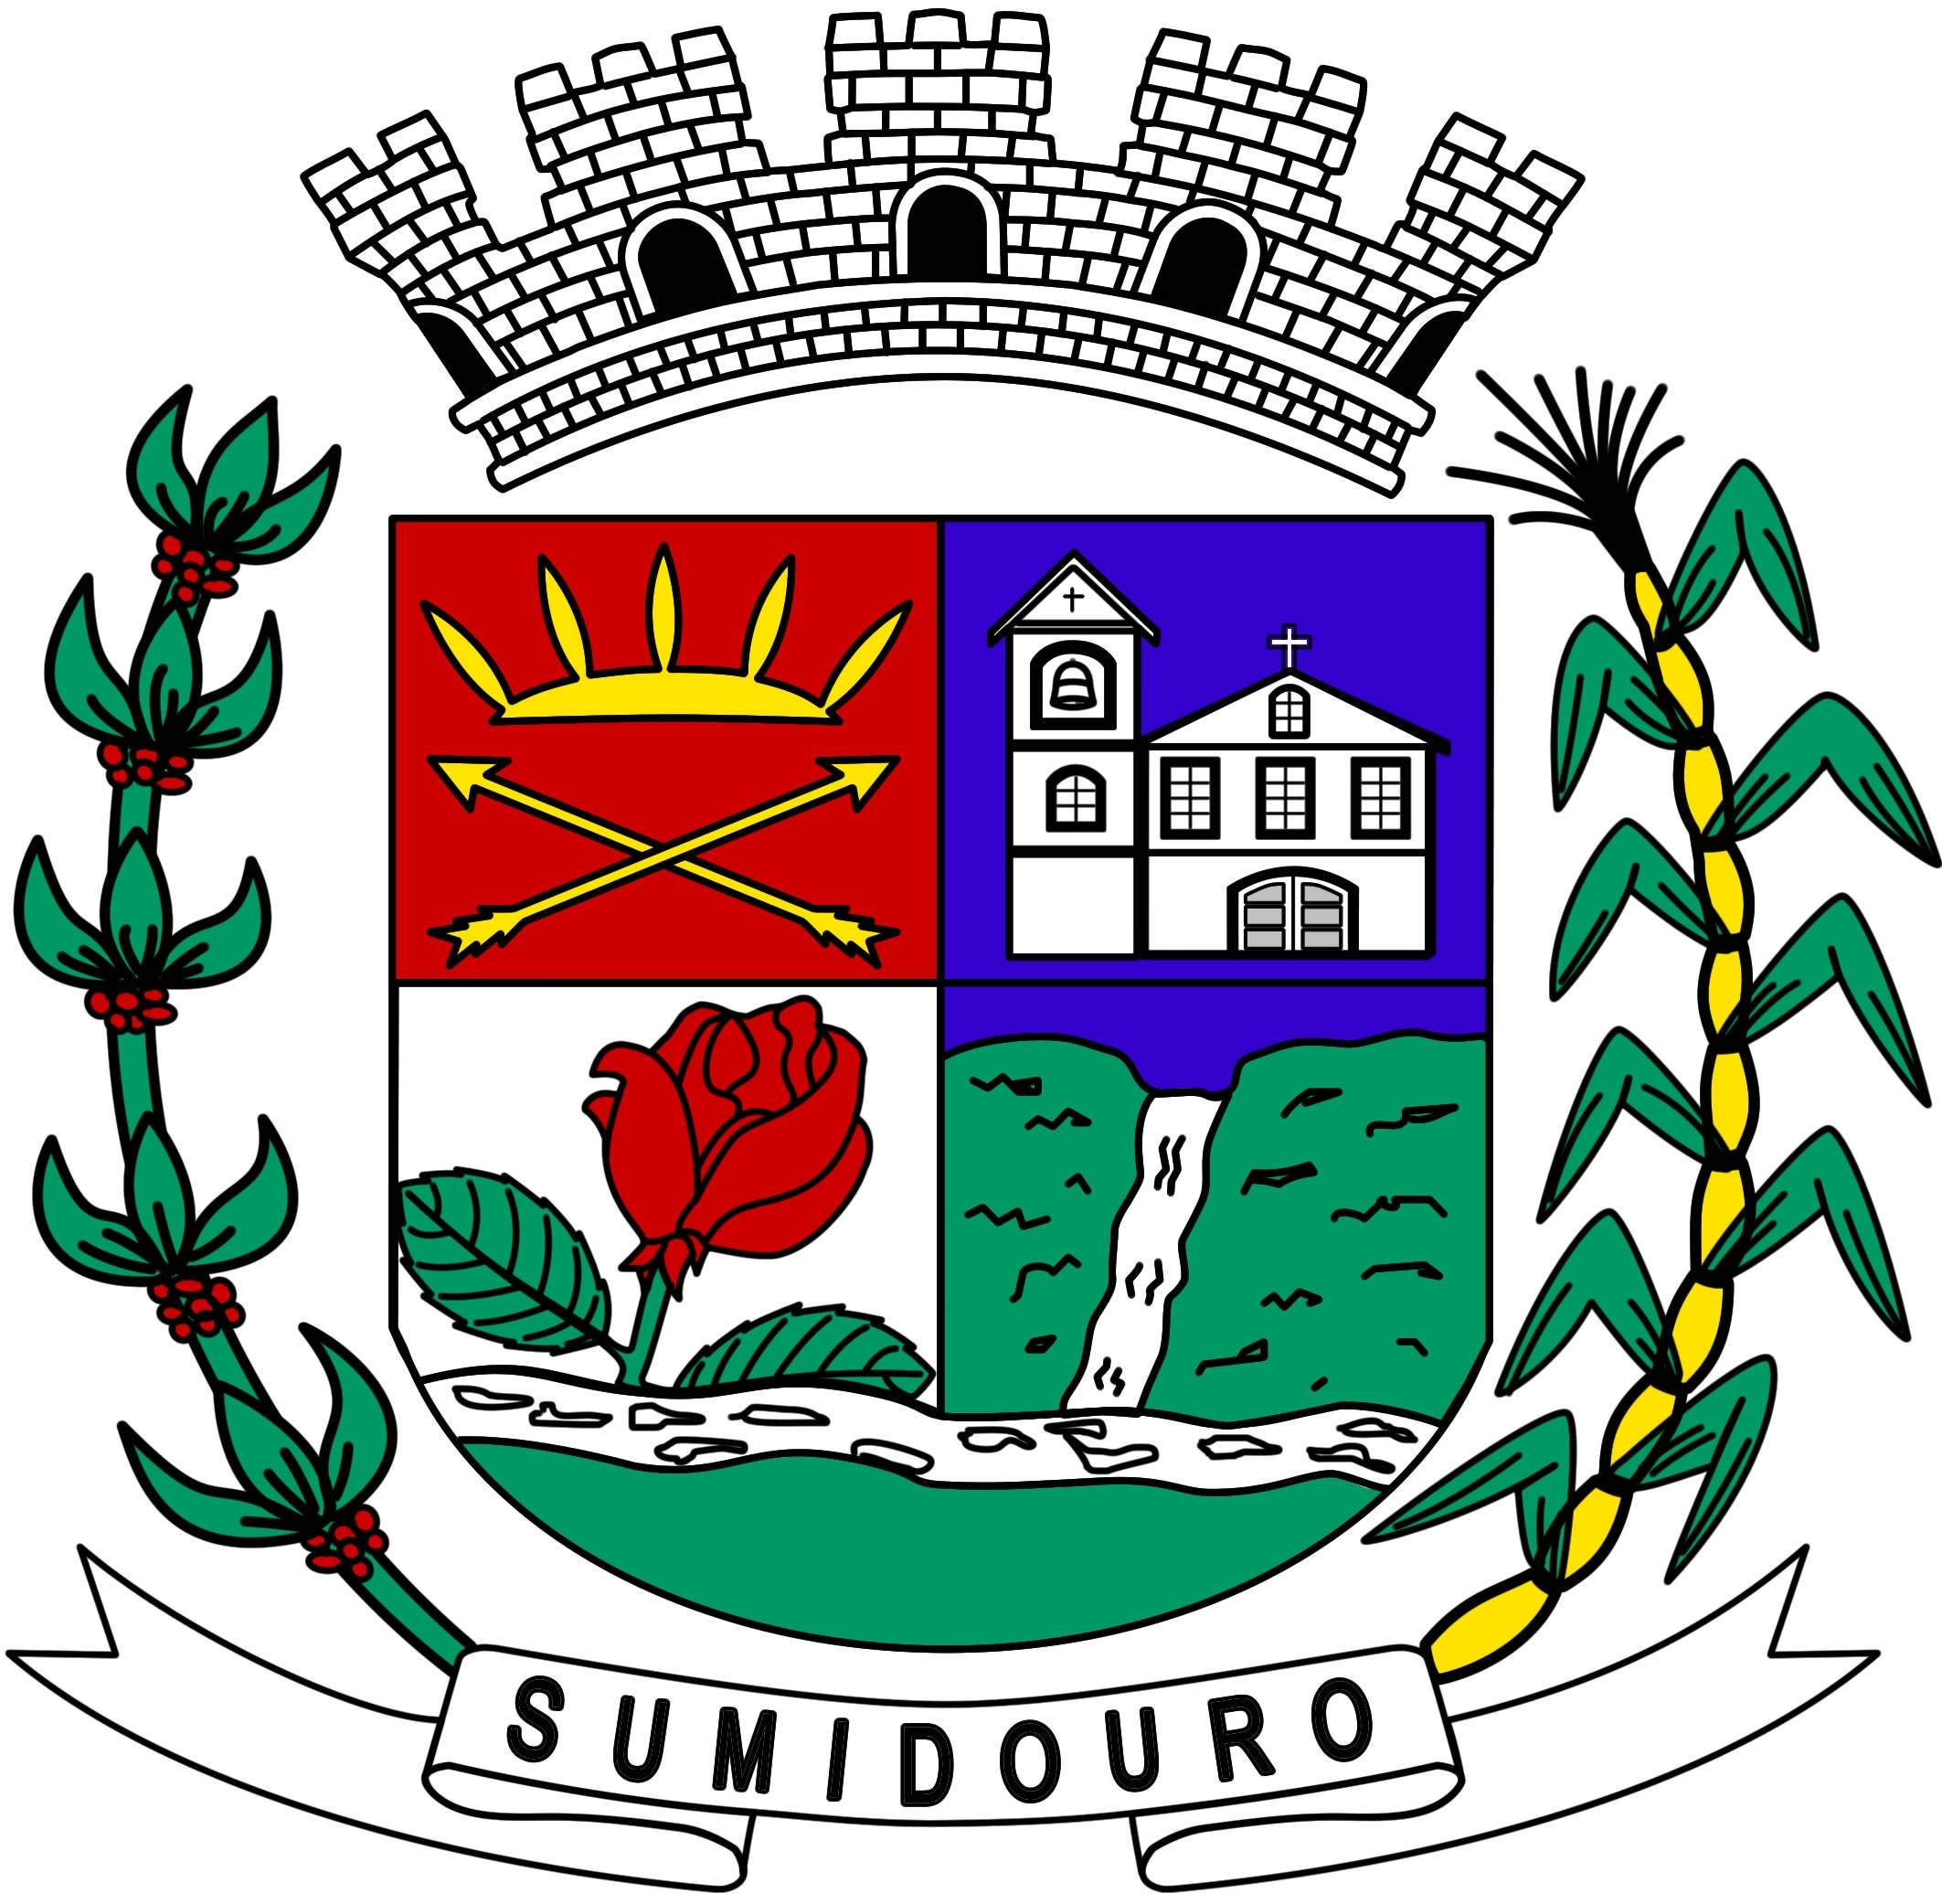 Concurso Público - 01/2019 - Prefeitura Municipal de Sumidouro/RJ